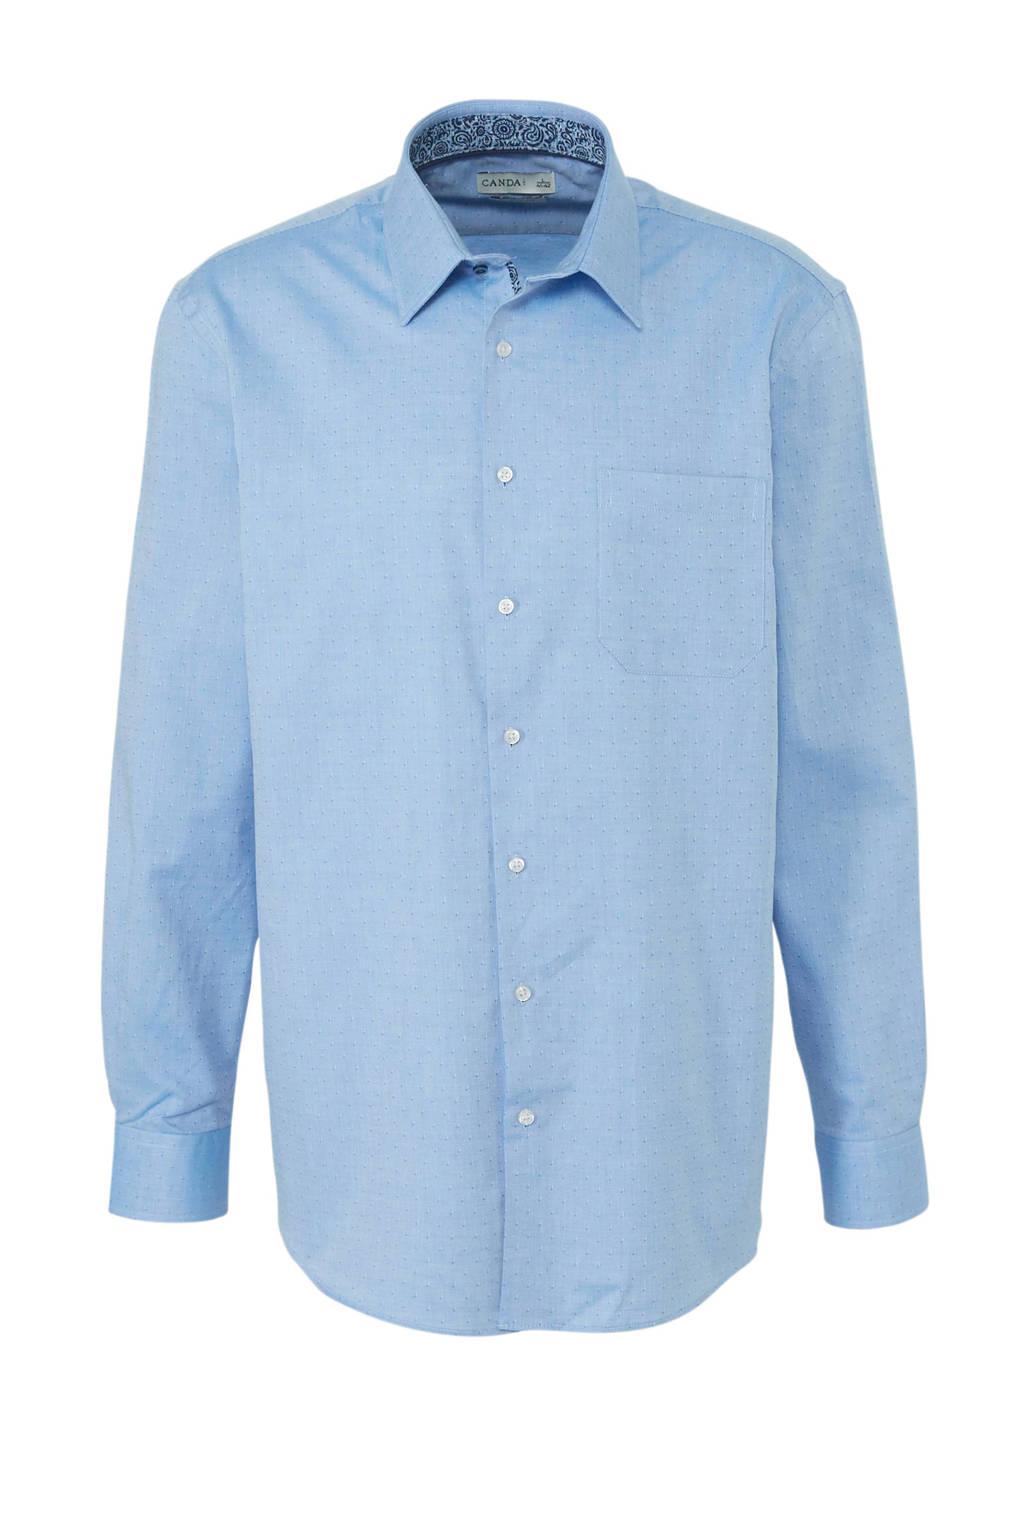 C&A Canda regular fit overhemd met all over print lichtblauw, Lichtblauw